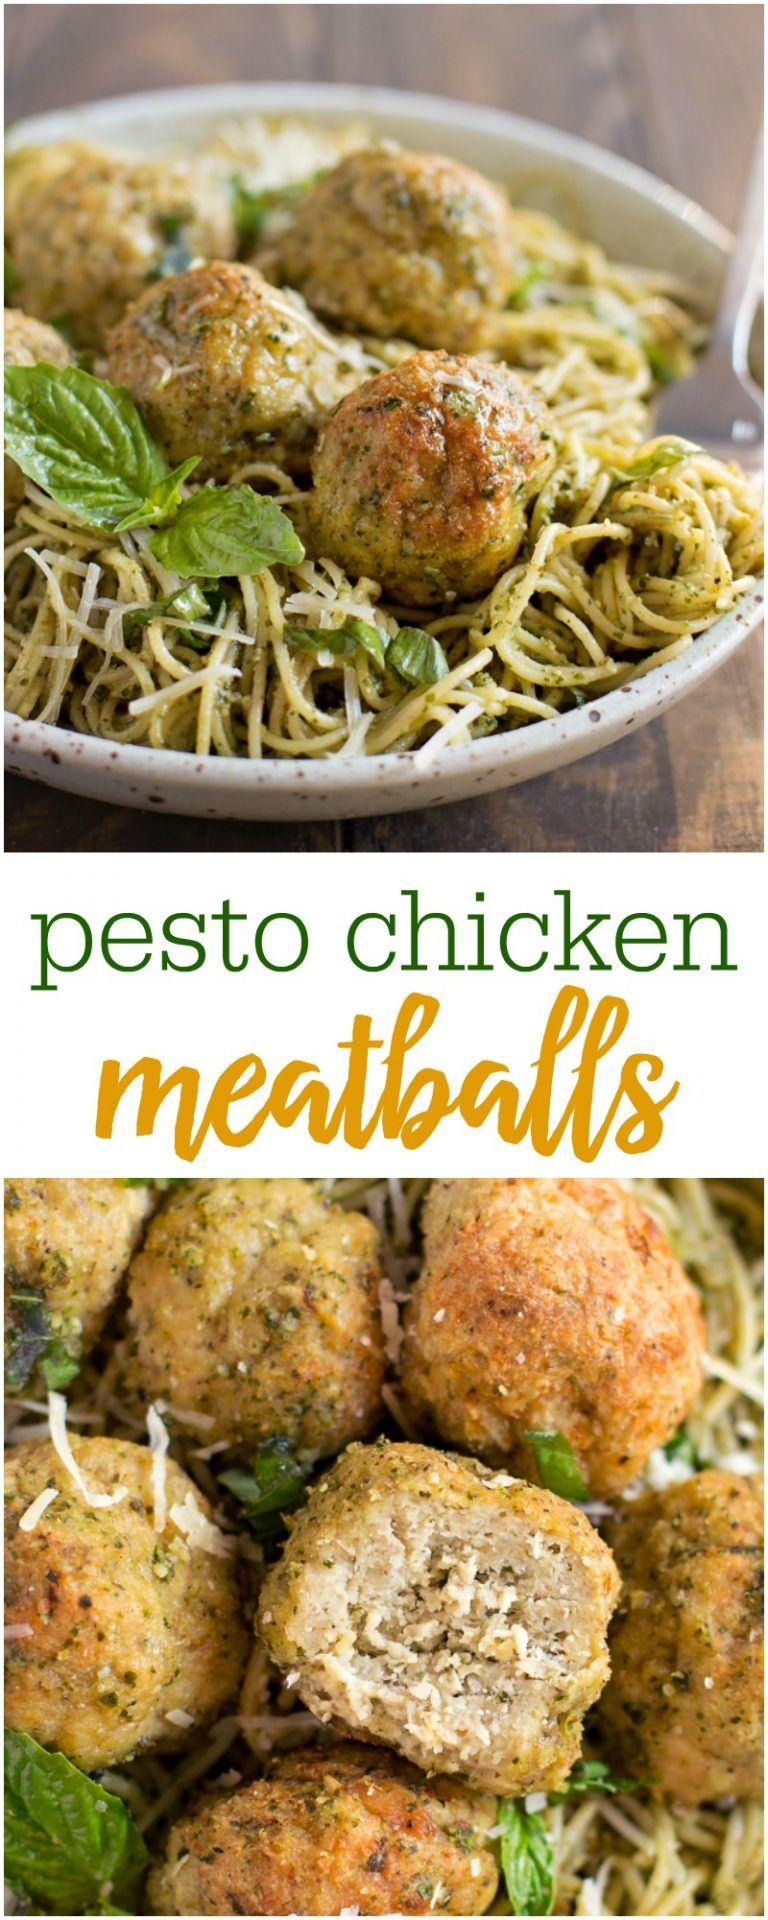 Pesto Chicken Meatballs Recipe (With images) Chicken